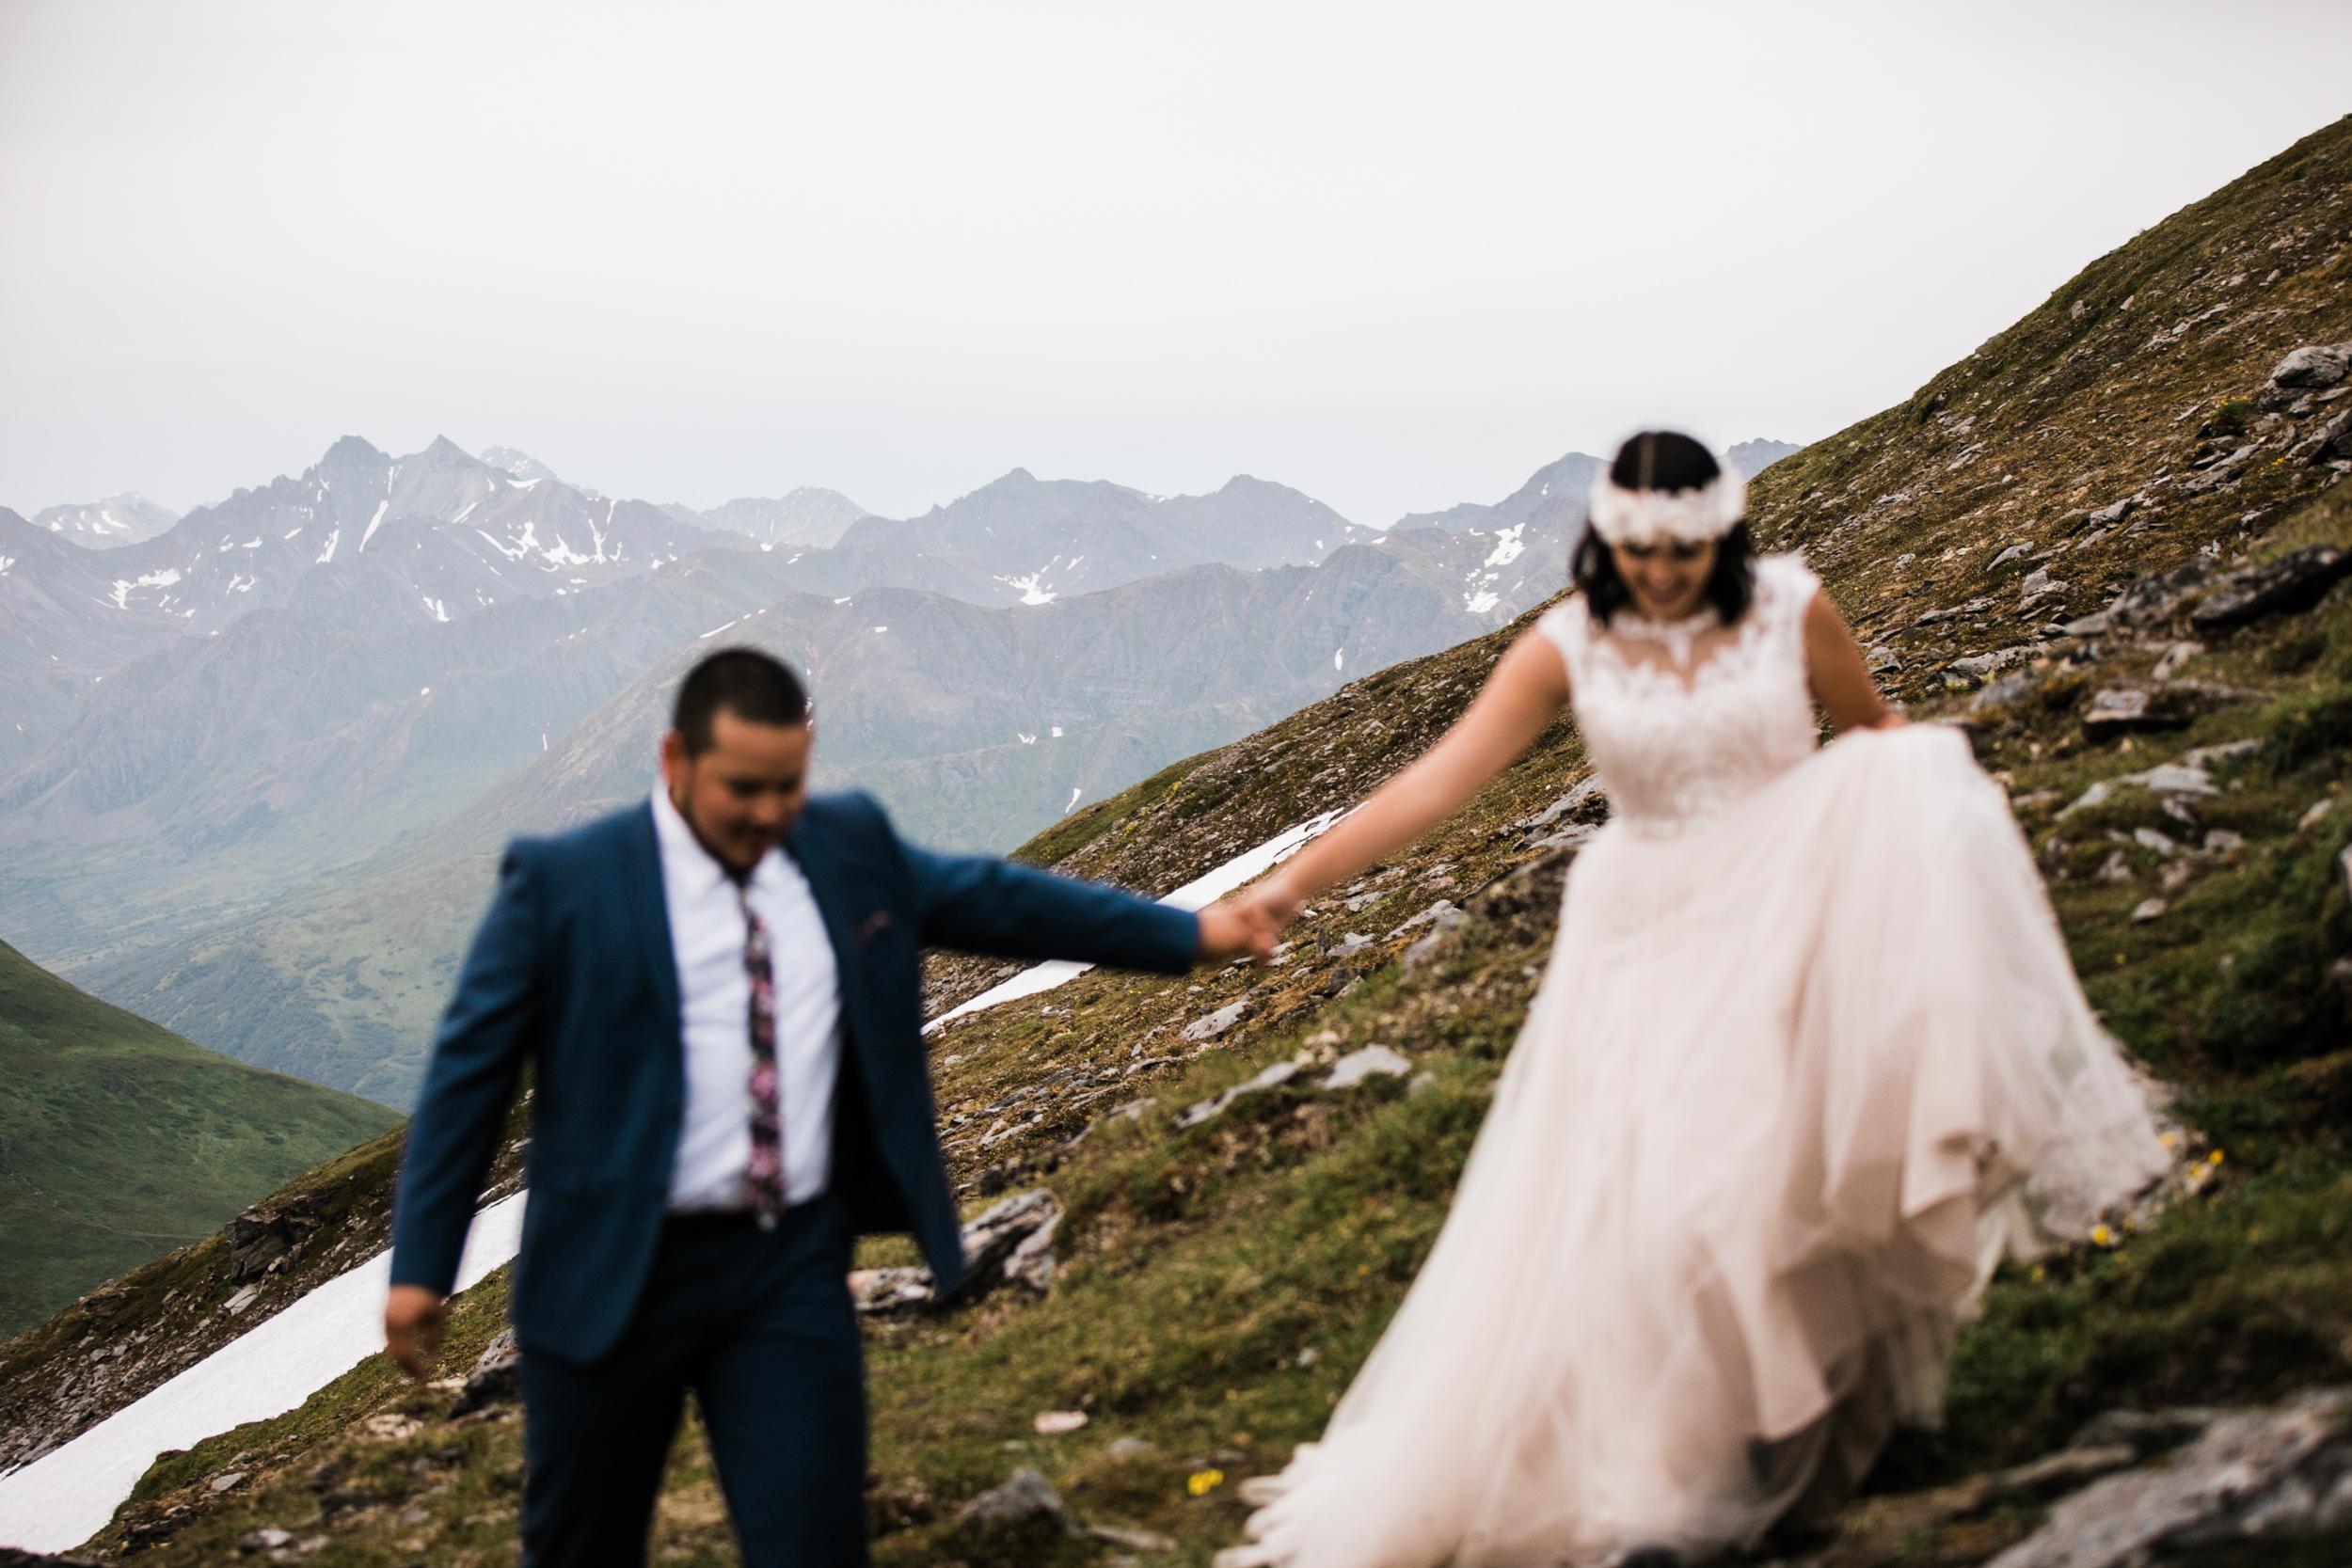 adventurous wedding portrait session at hatcher pass near anchorage | alaska elopement photographer | the hearnes adventure photography | www.thehearnes.com